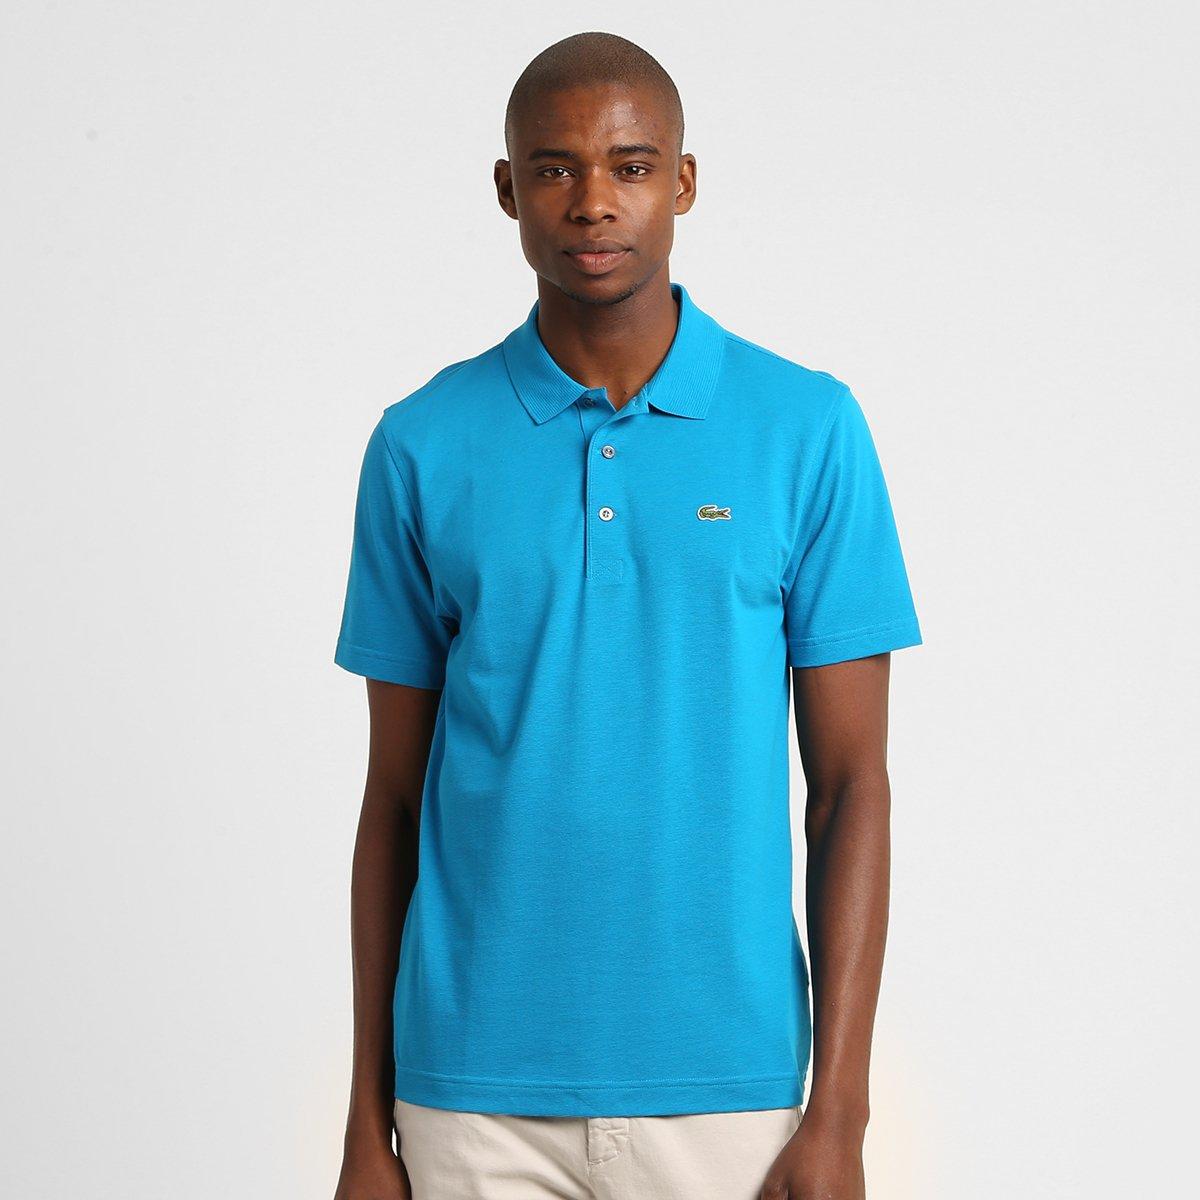 8ba1c5f1dc0 ... Camisa Polo Lacoste Super Light Masculina